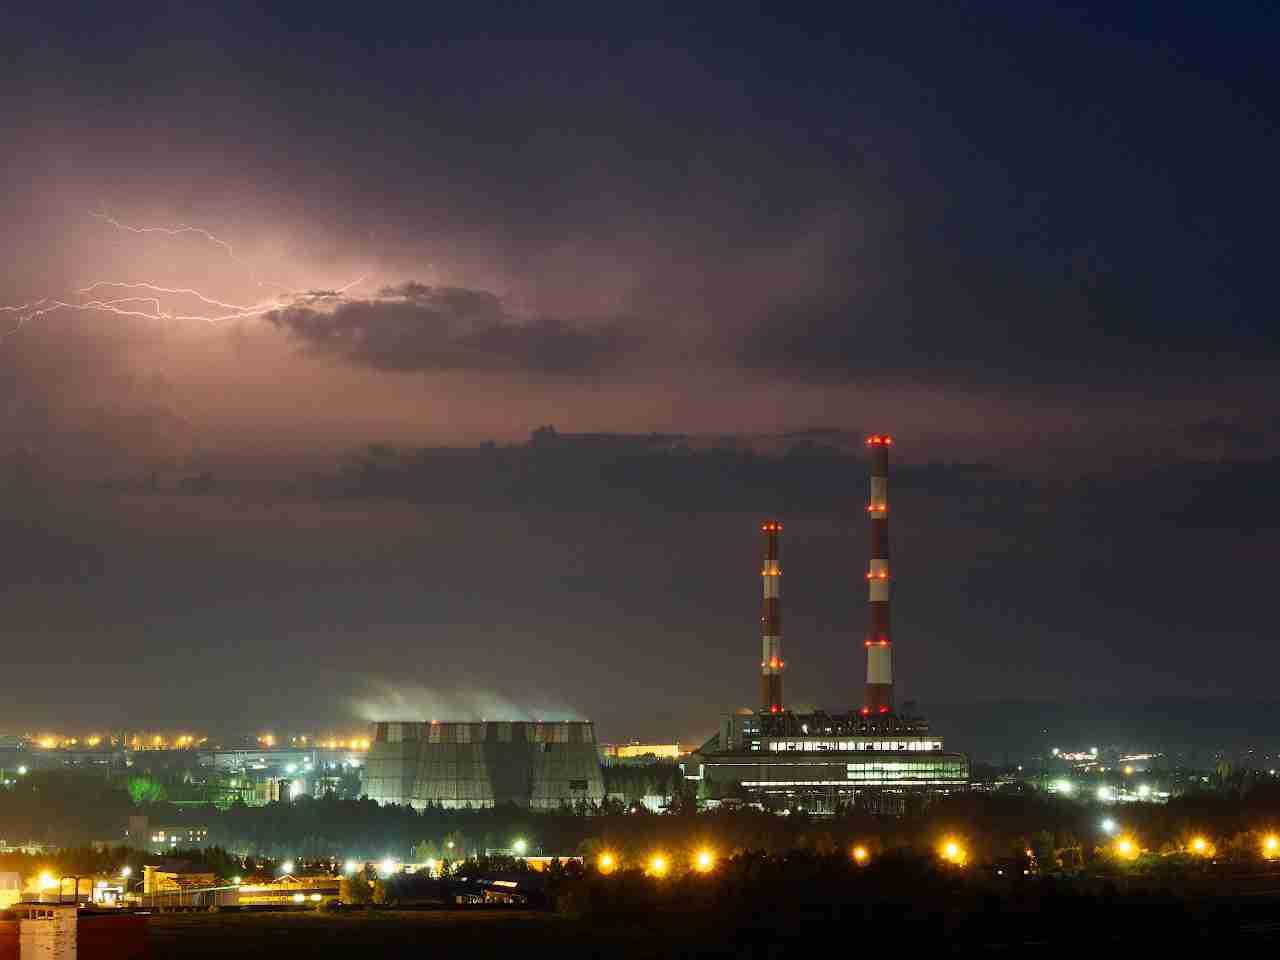 В Петропавловске на модернизацию ТЭЦ потратили 16 млрд тенге